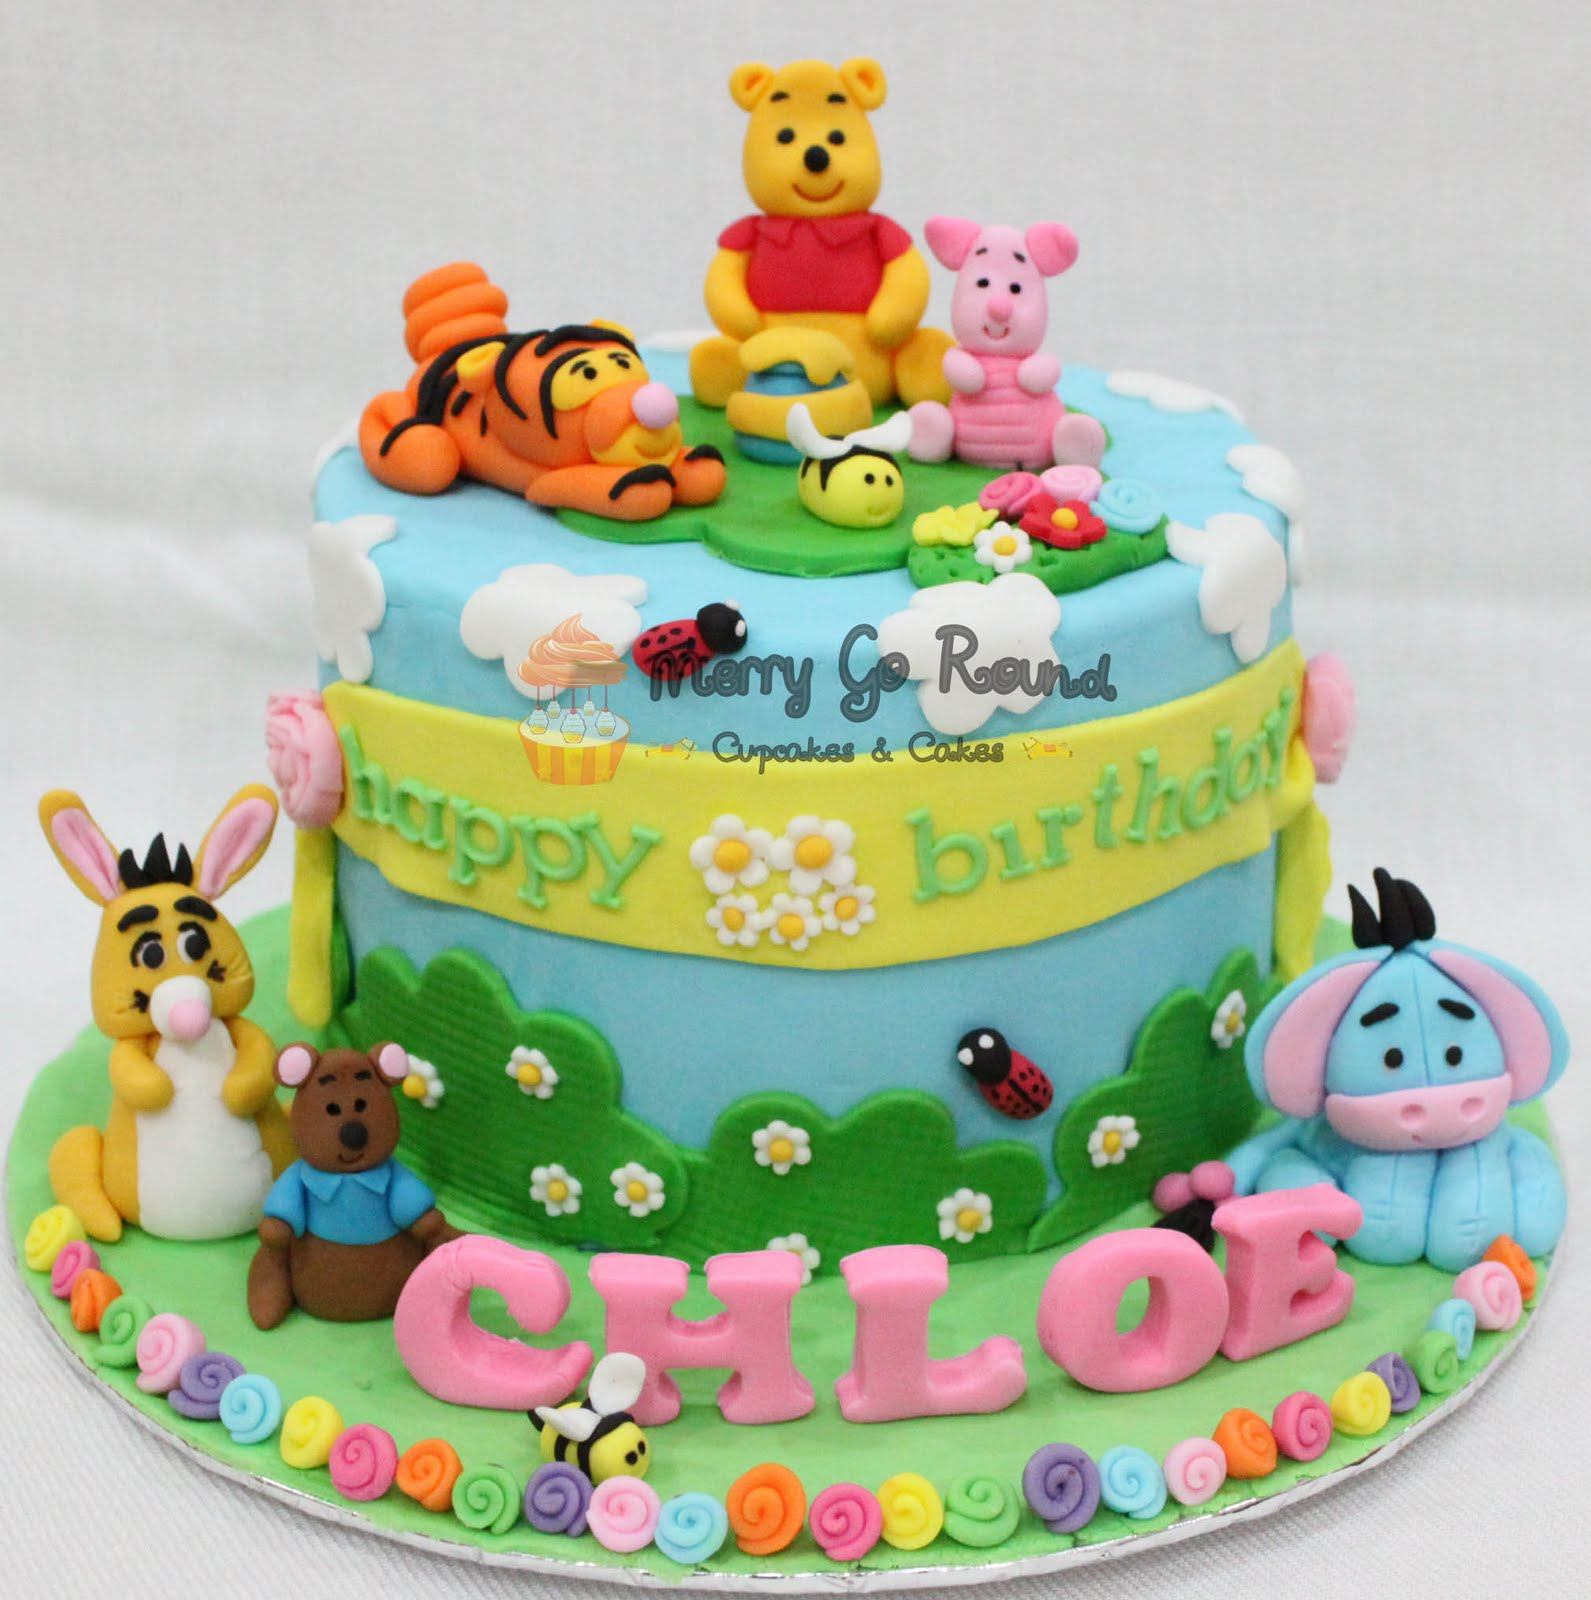 Merry Go Round - Cupcakes & Cakes: Winnie The Pooh Birthday Cakes